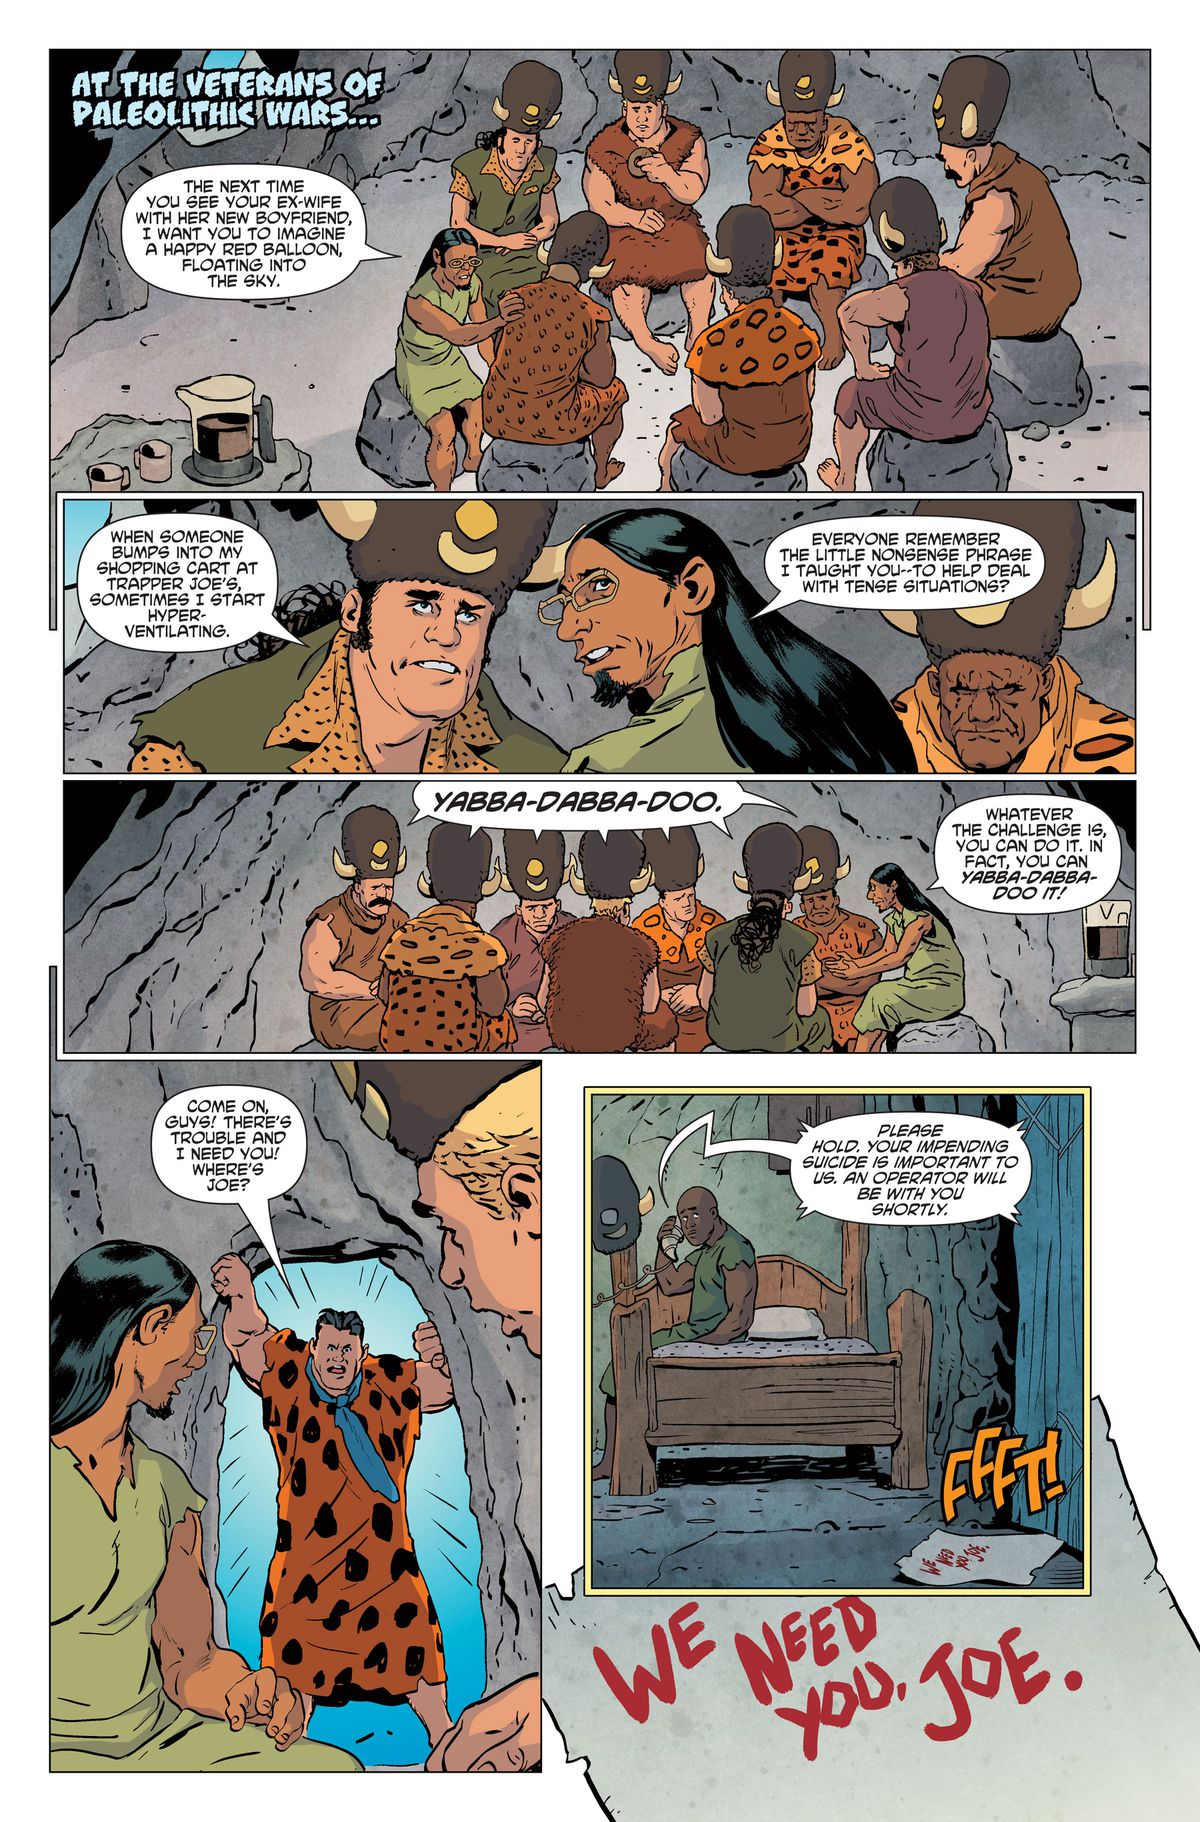 the creators of the flintstones comic on bringing existential dread